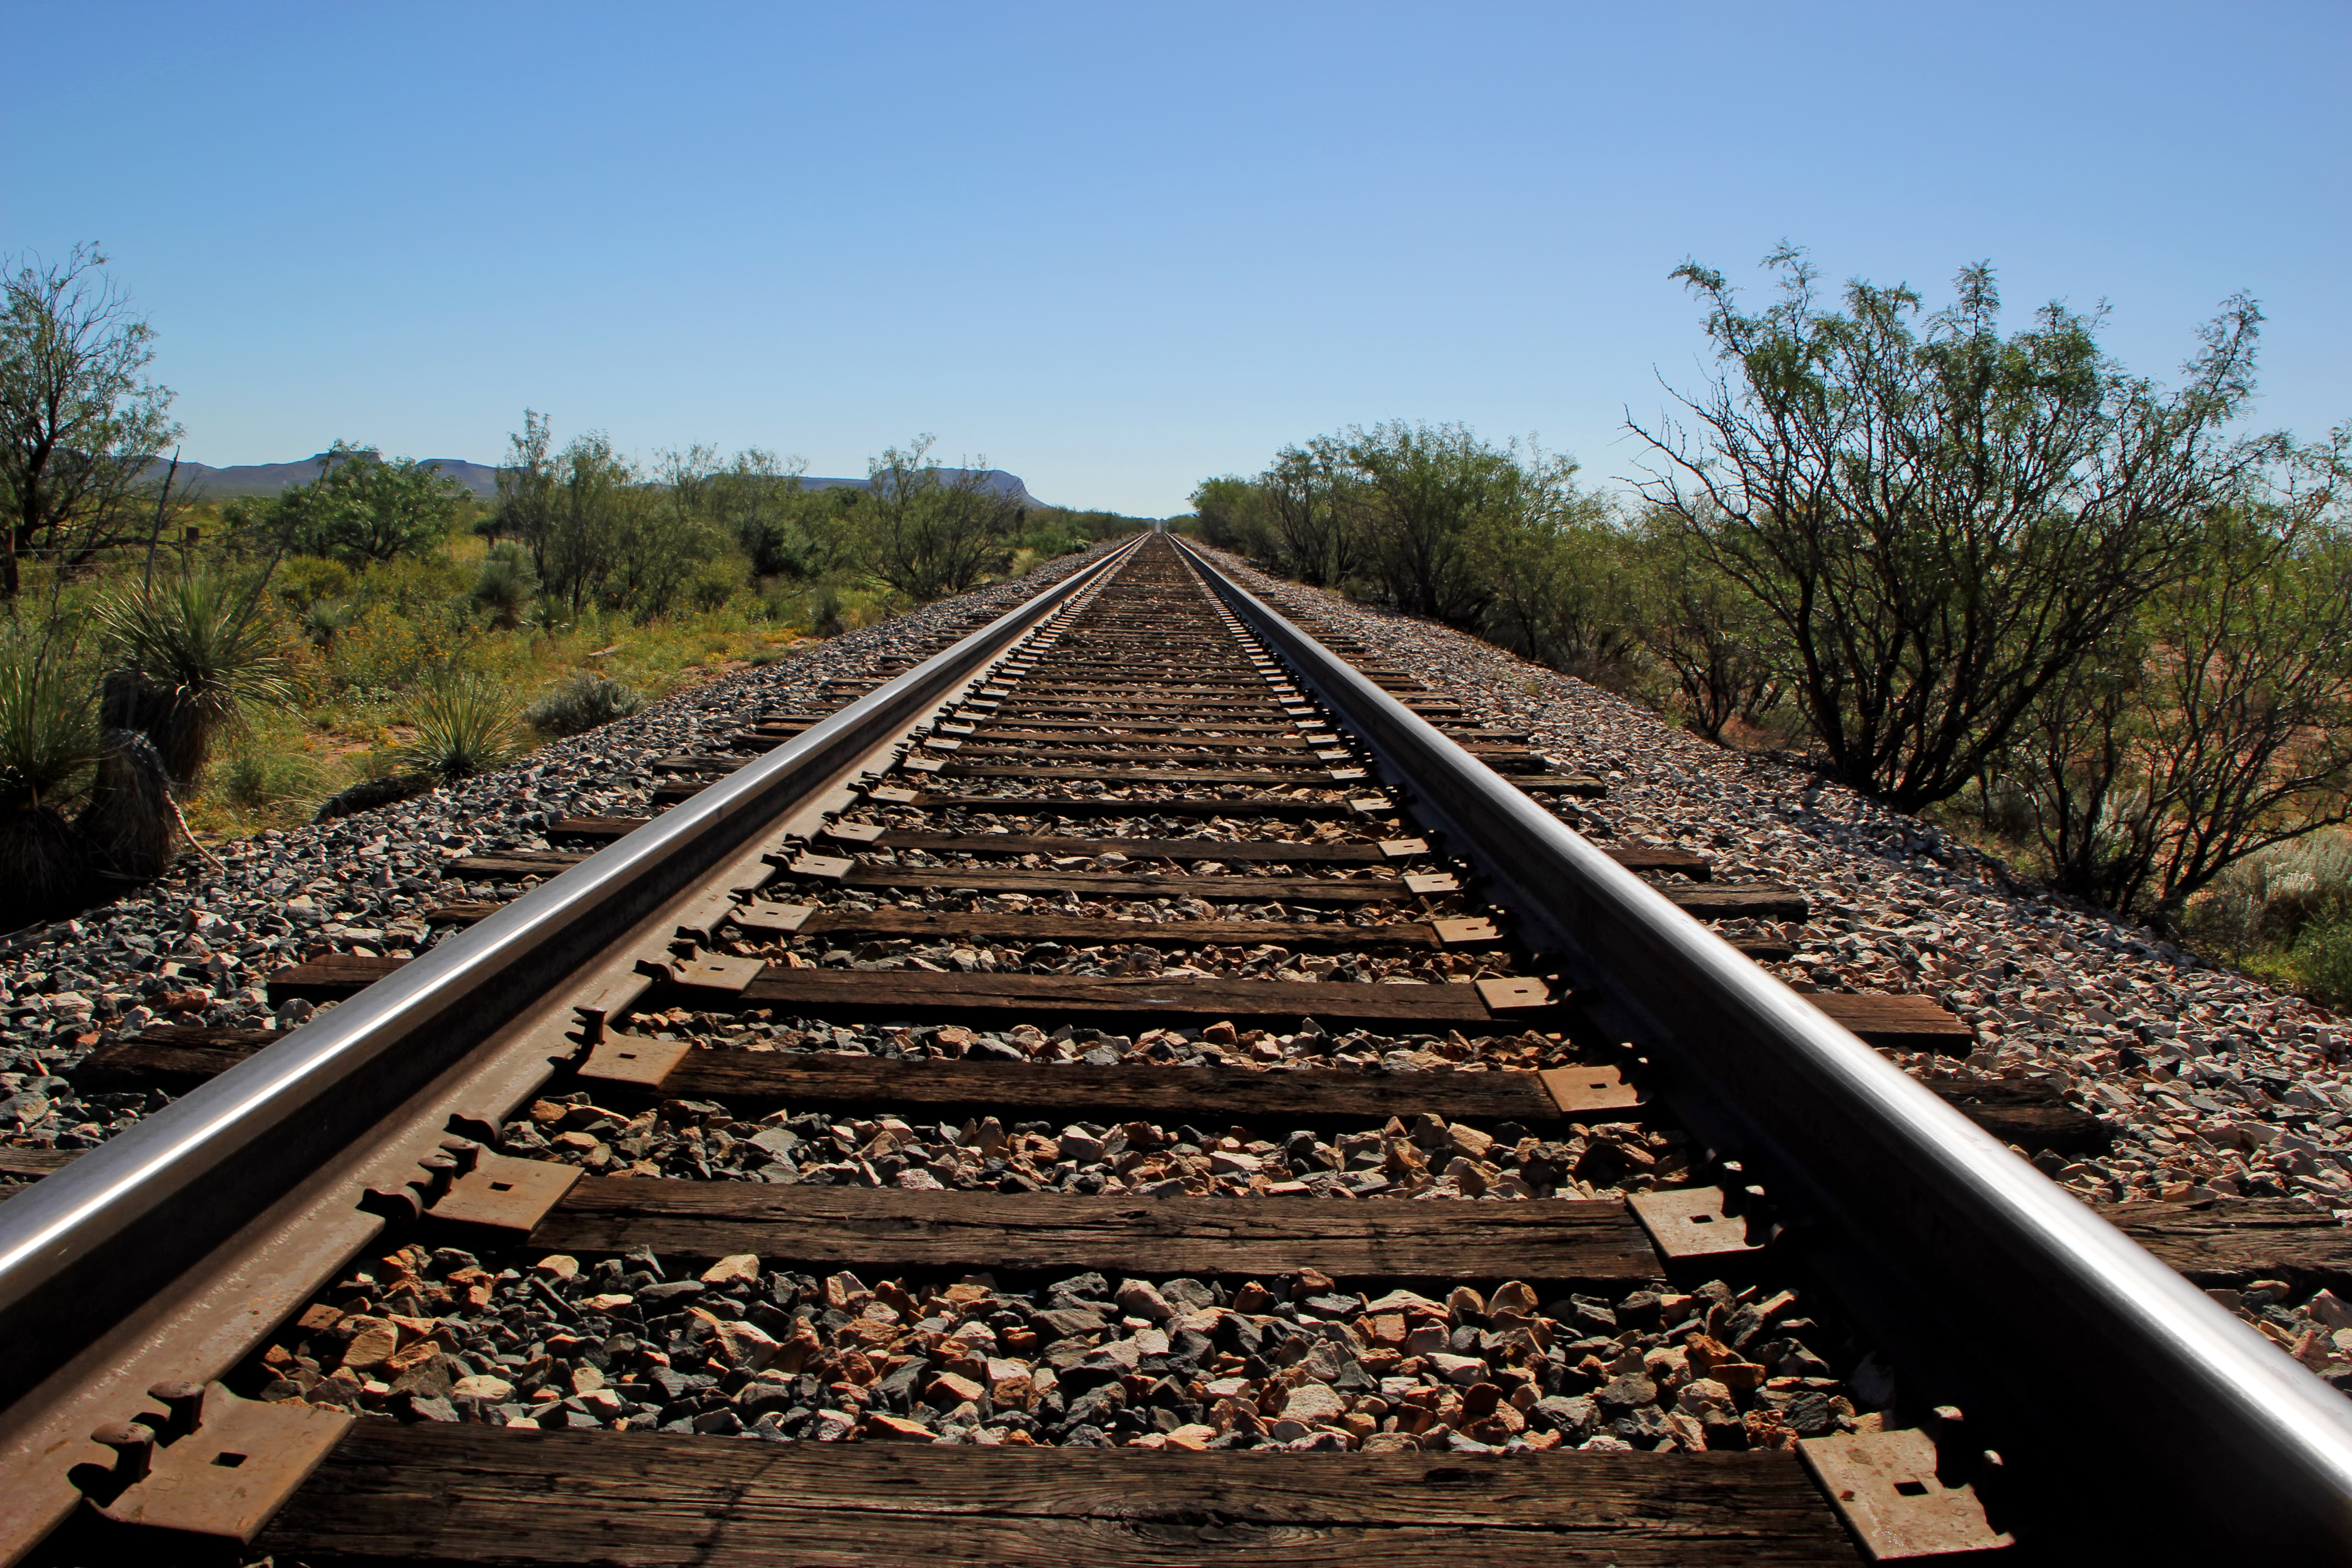 Fatal Pedestrian / Train Accident